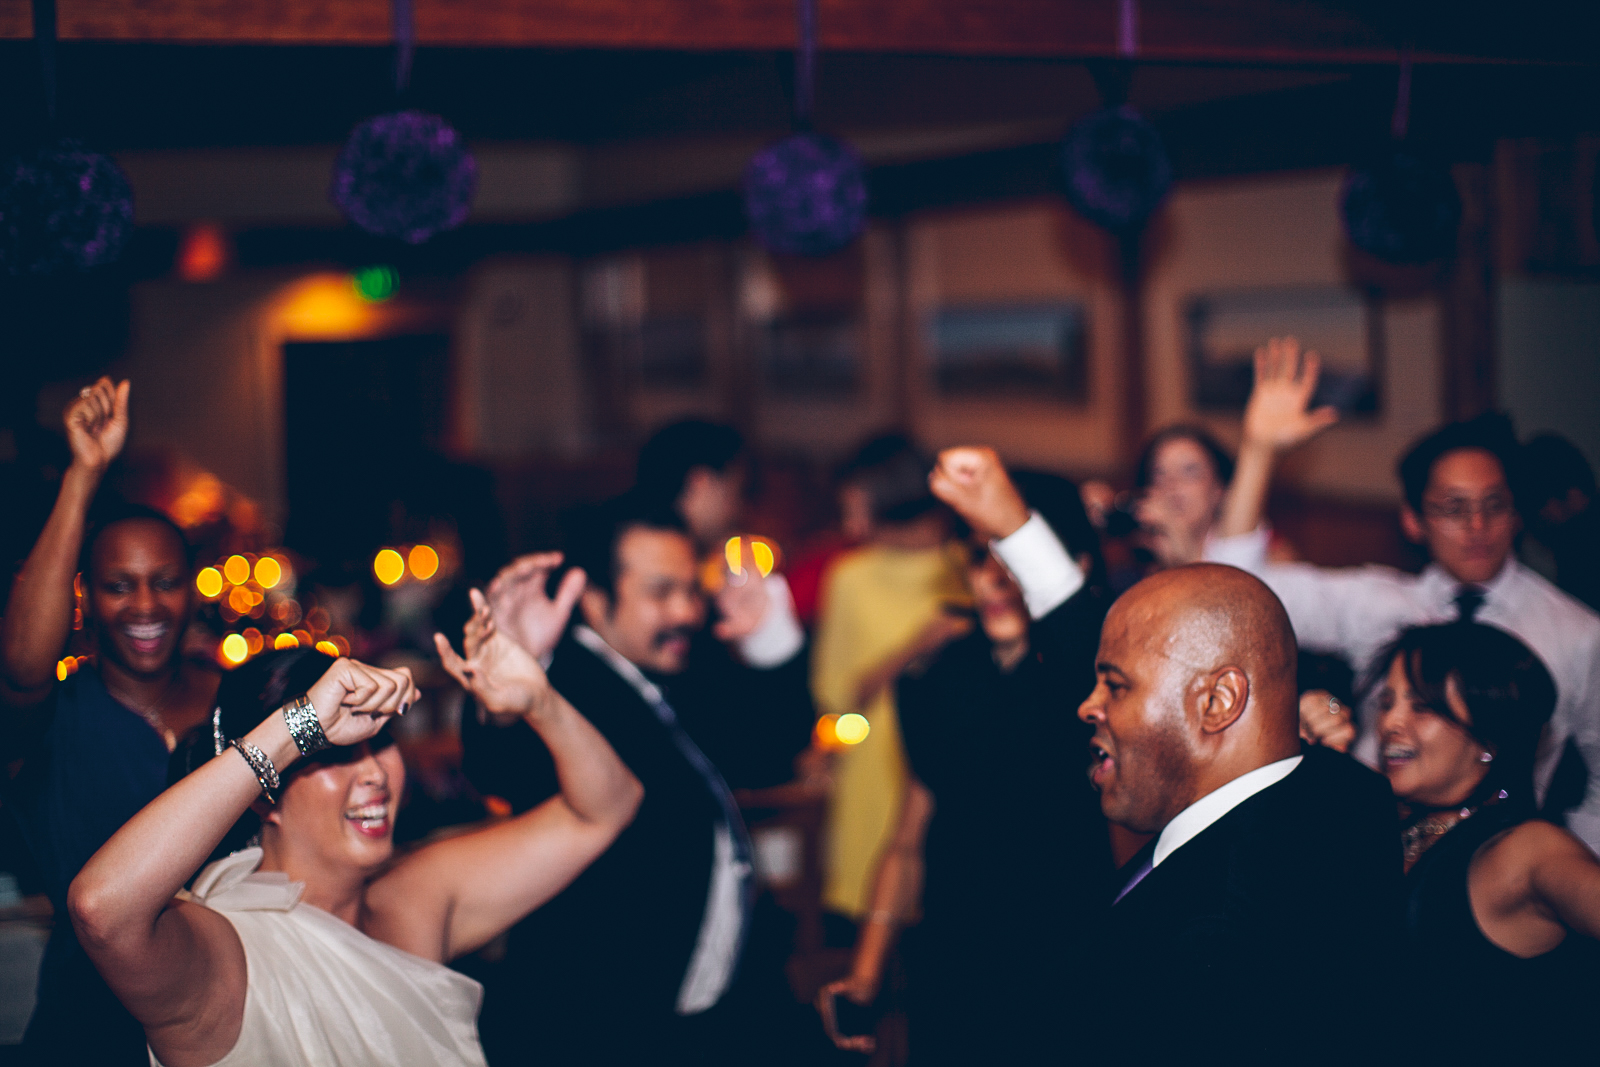 greens_restaurant_wedding_photography_san_franscisco_ebony_siovhan_bokeh_photography_82.jpg